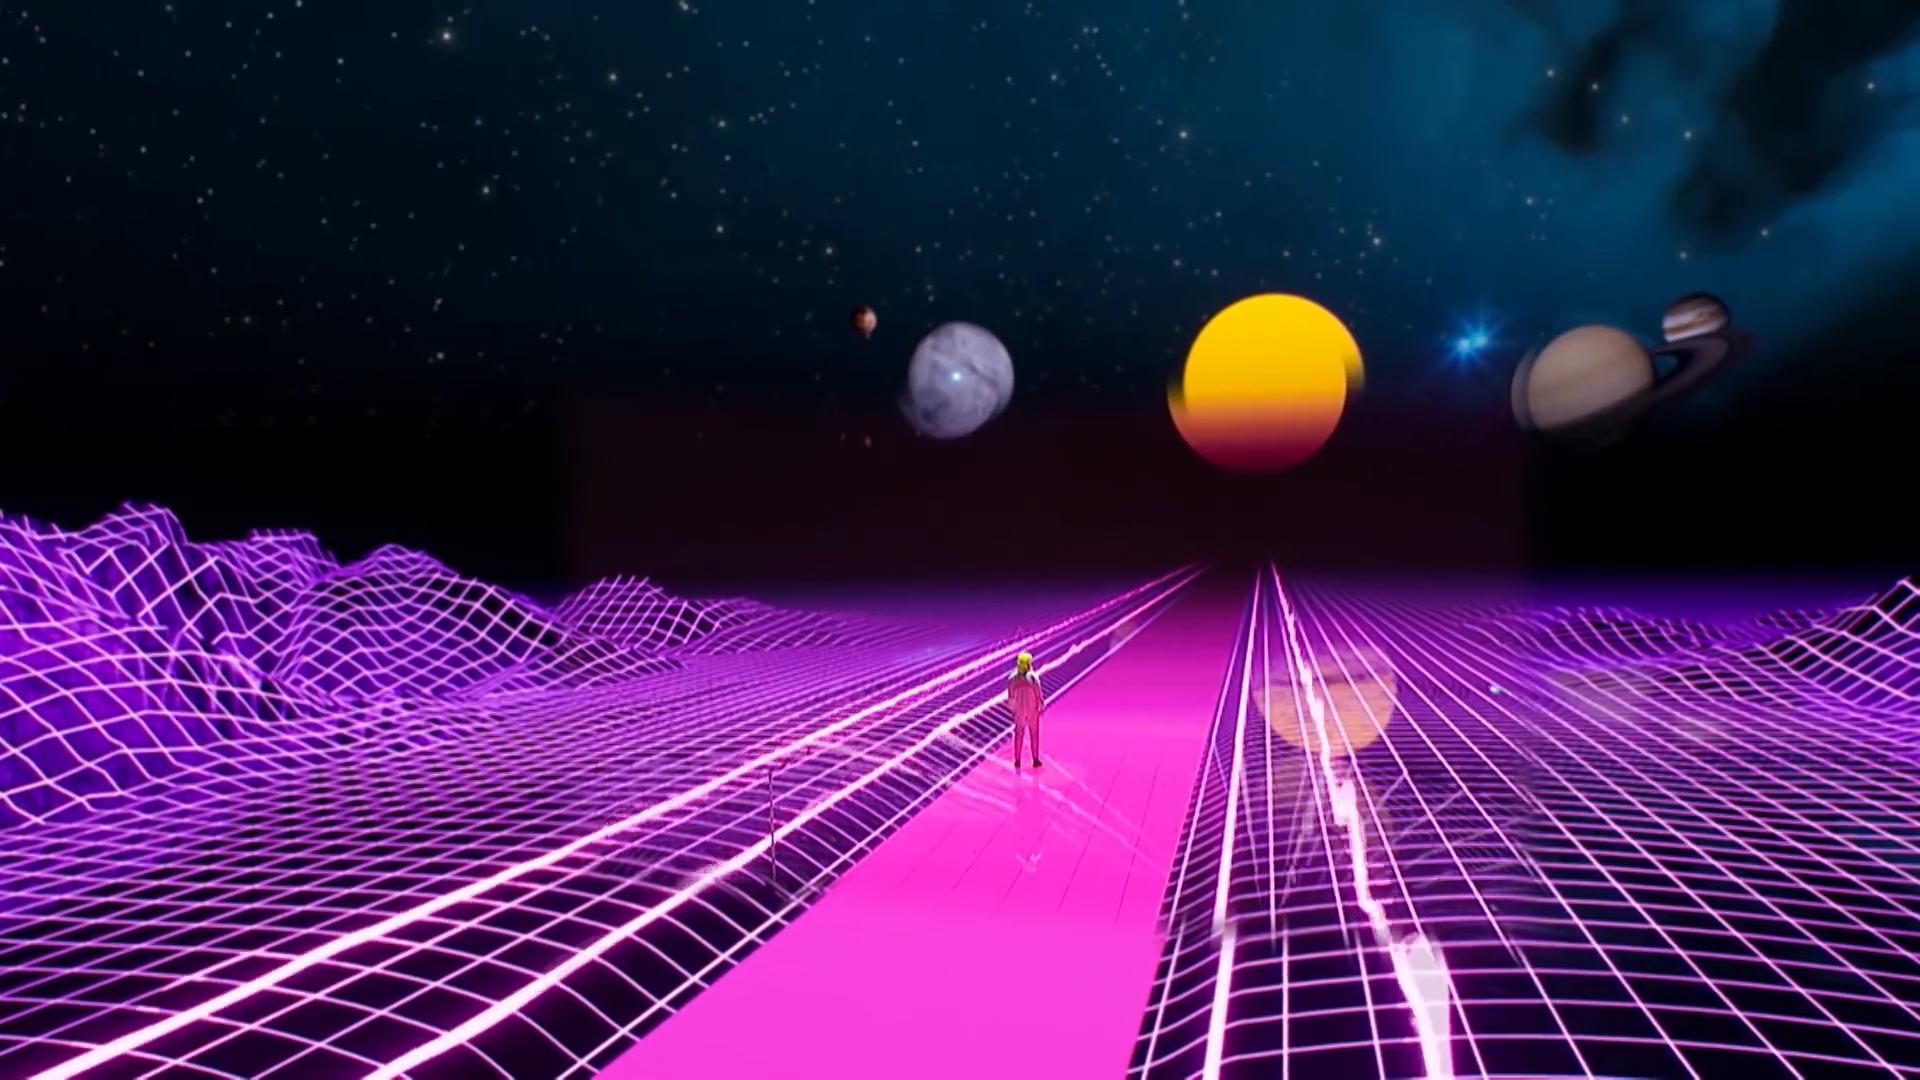 BONAVEGA Delivers Glam Rock Rendition of Blinding Lights by The Weeknd – America's Got Talent 2020.00_00_01_14.Still001